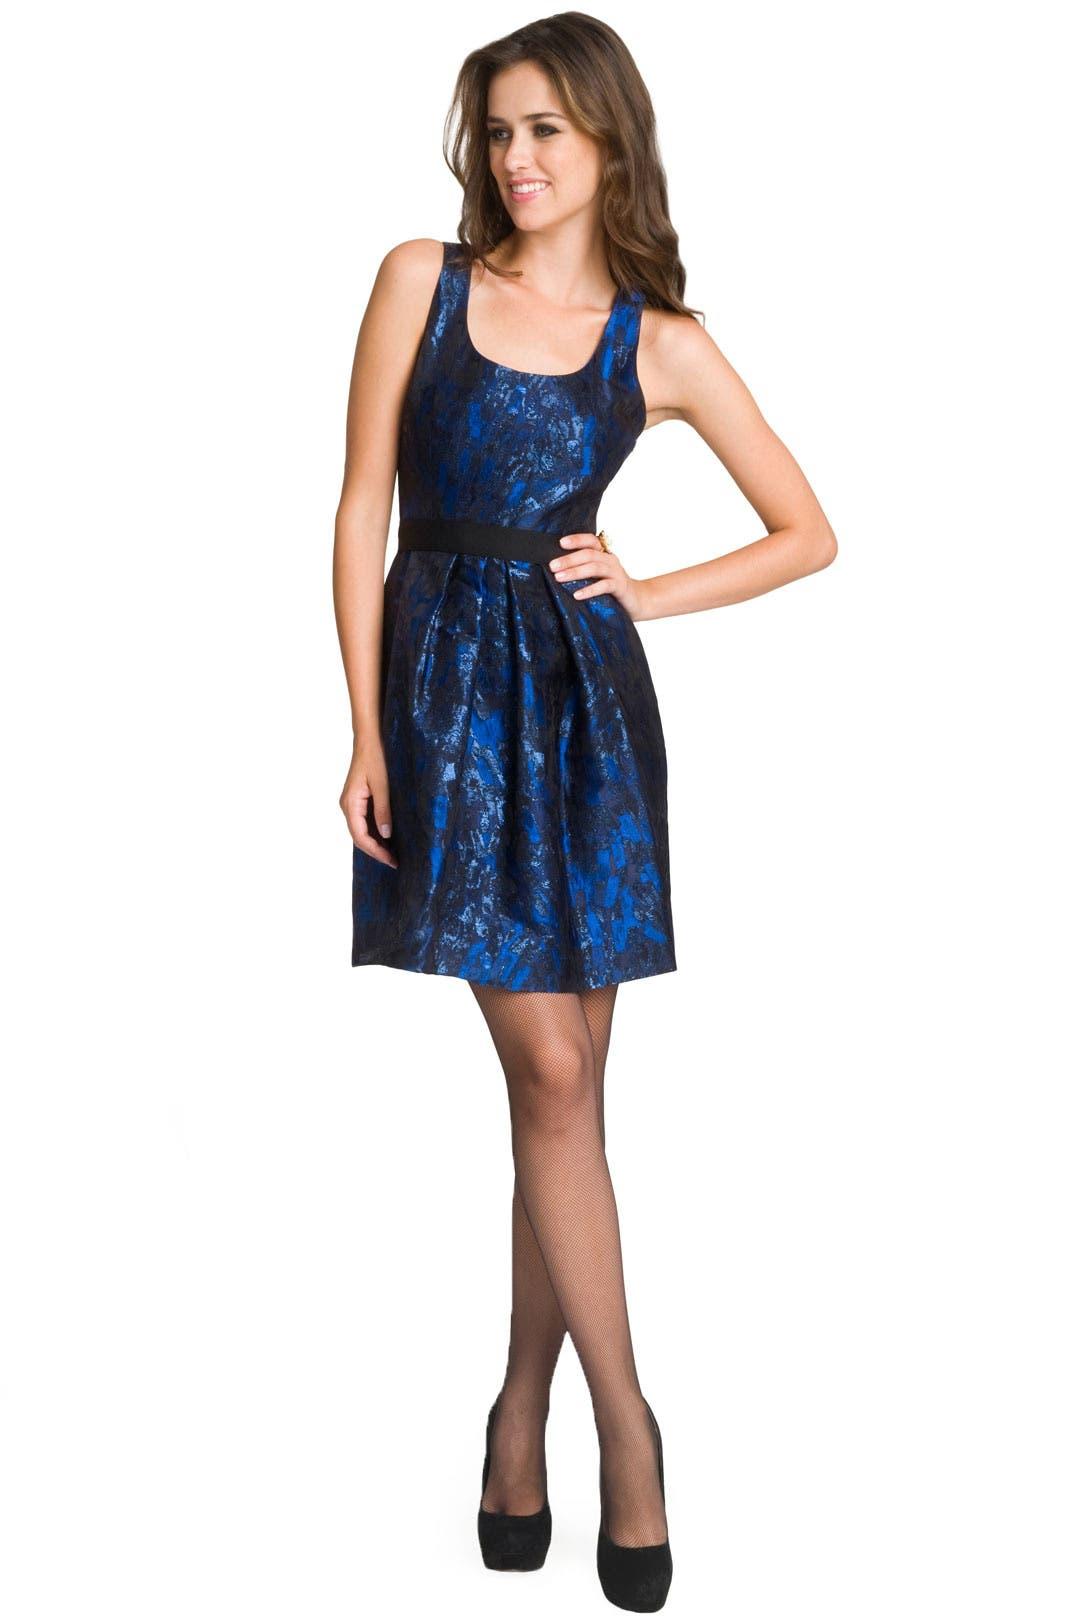 Retro Brocade dress by Lela Rose